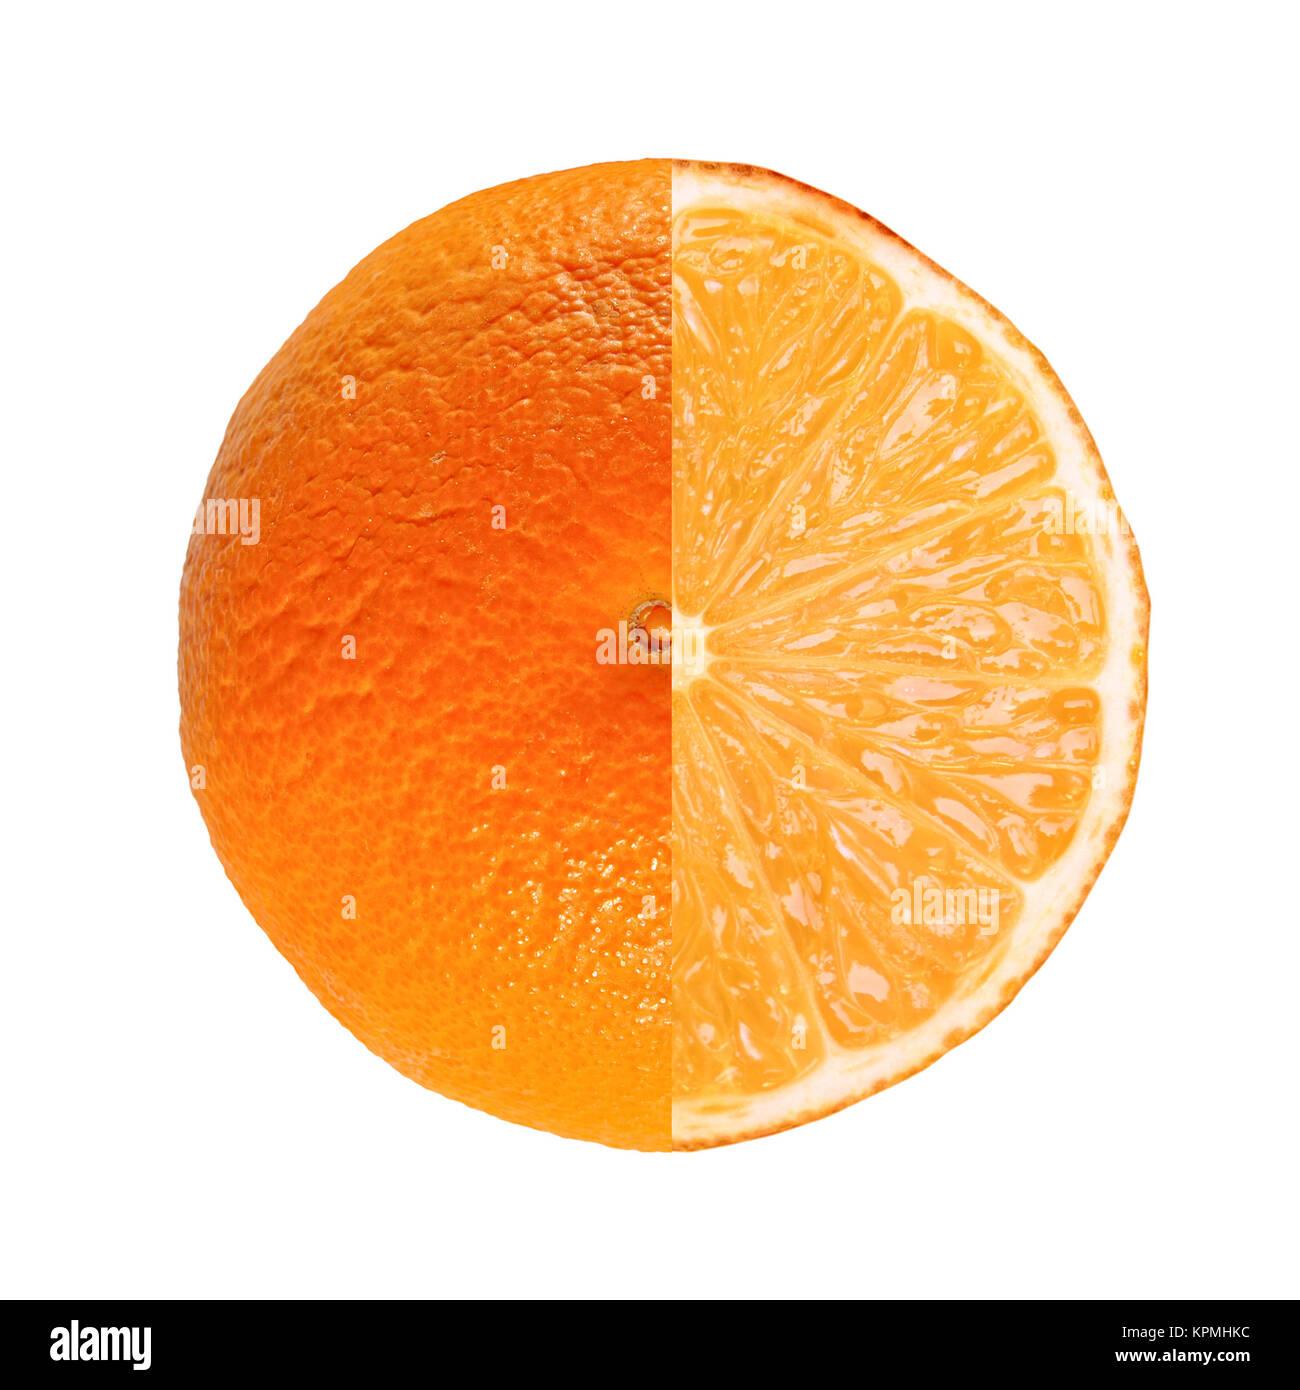 Orange fruit full and sliced Stock Photo